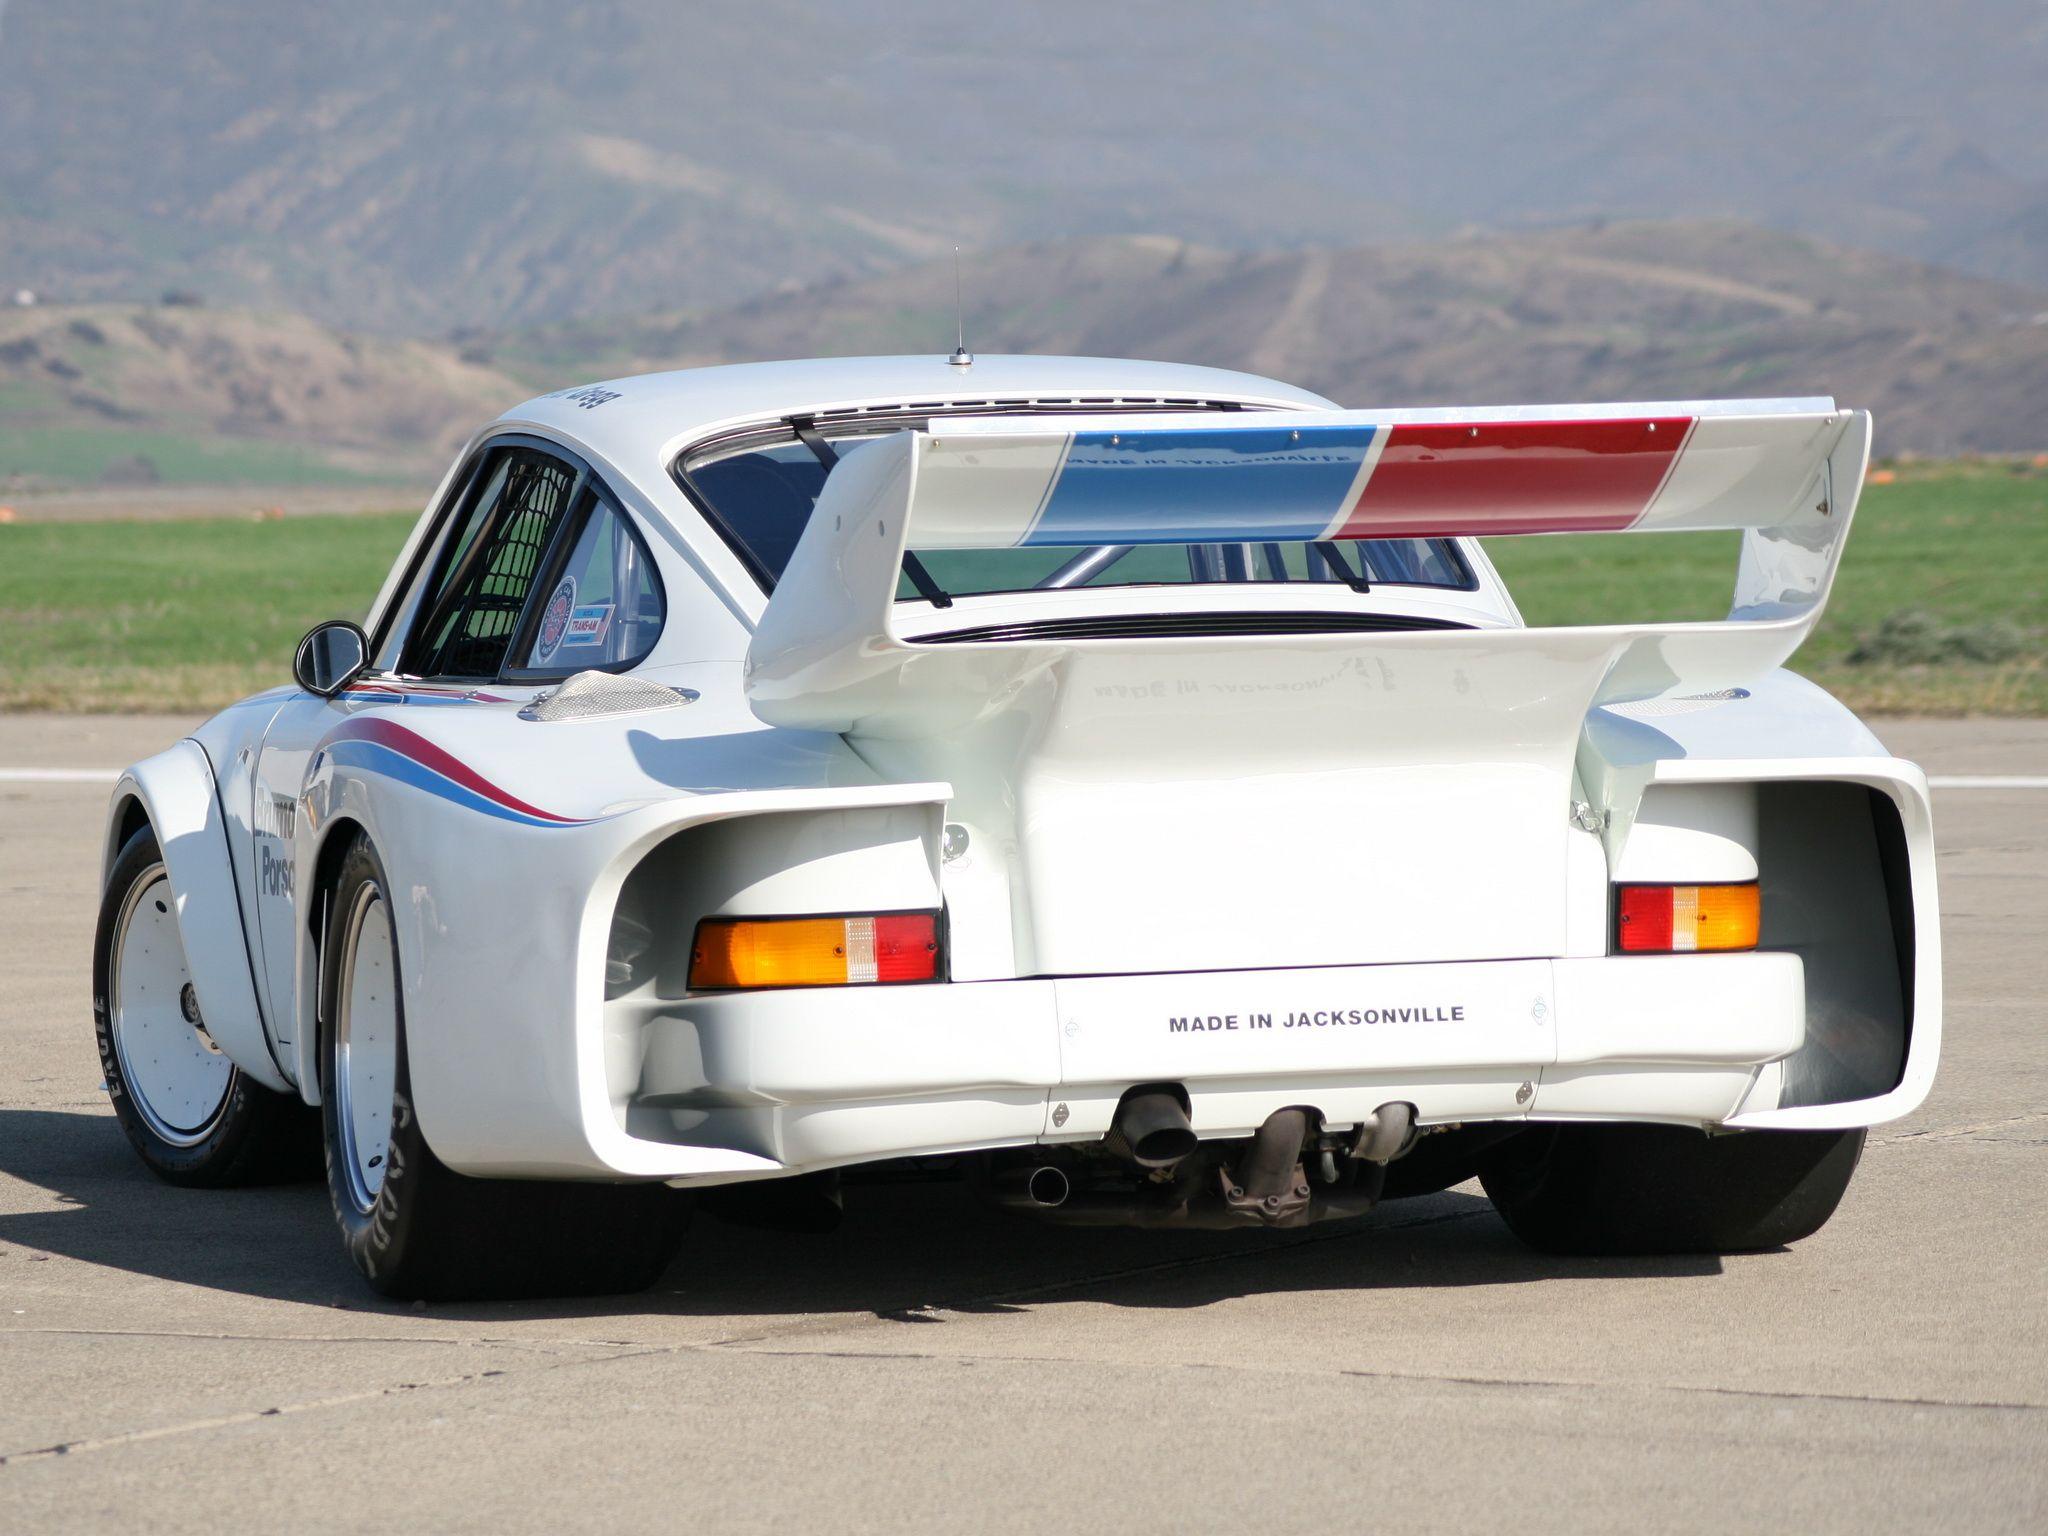 Porsche Brumos 934 5 Rsr Porsche 934 Porsche 934 Turbo Rsr Porsche